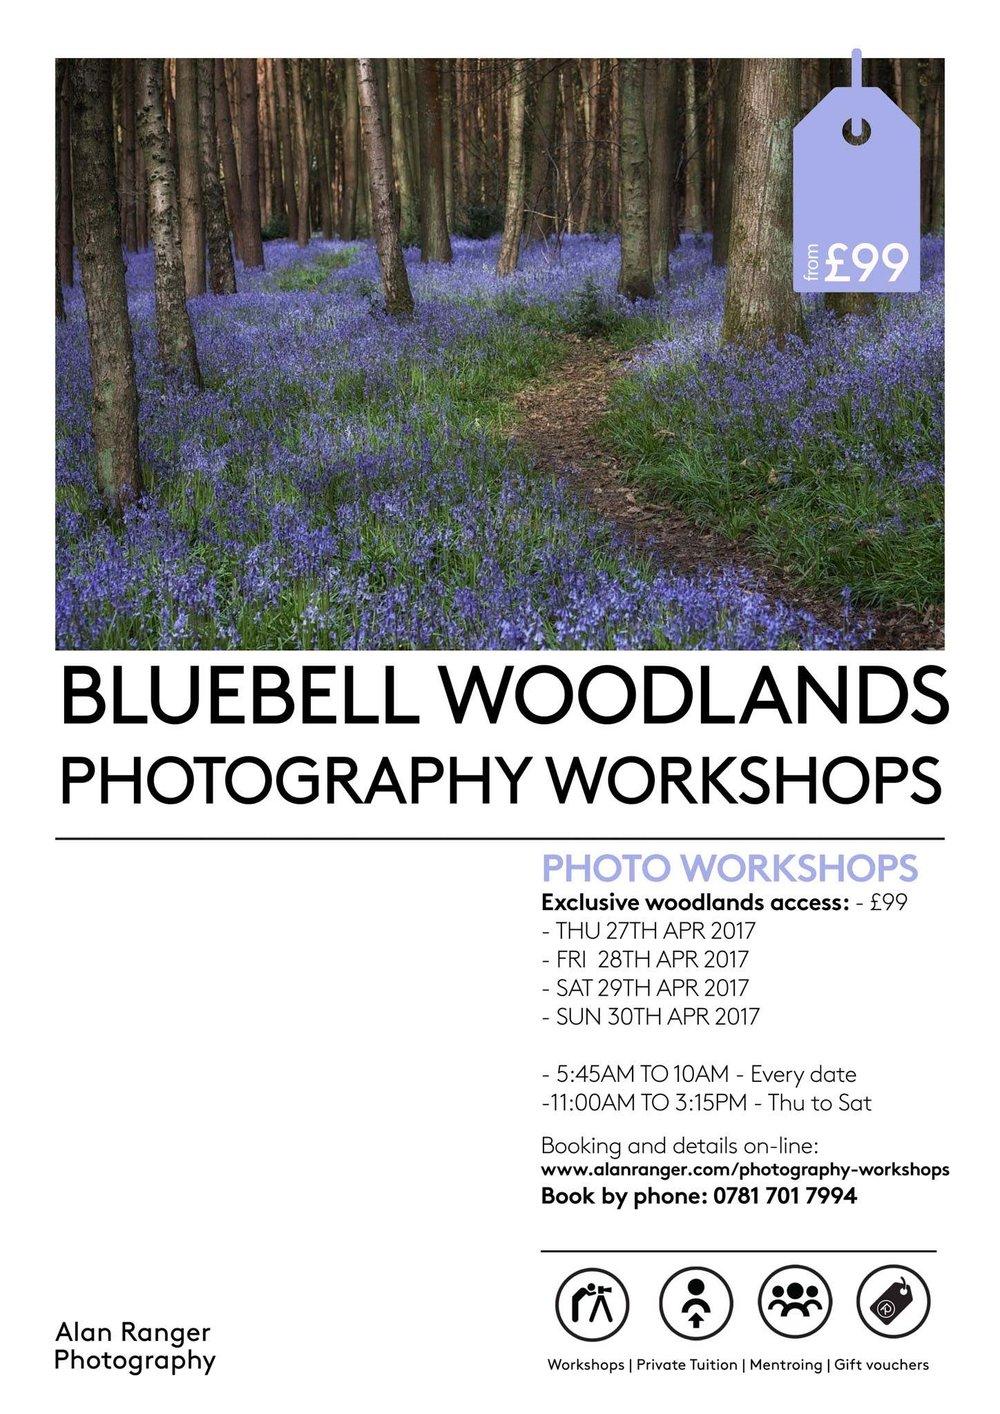 bluebell woodland photography workshops